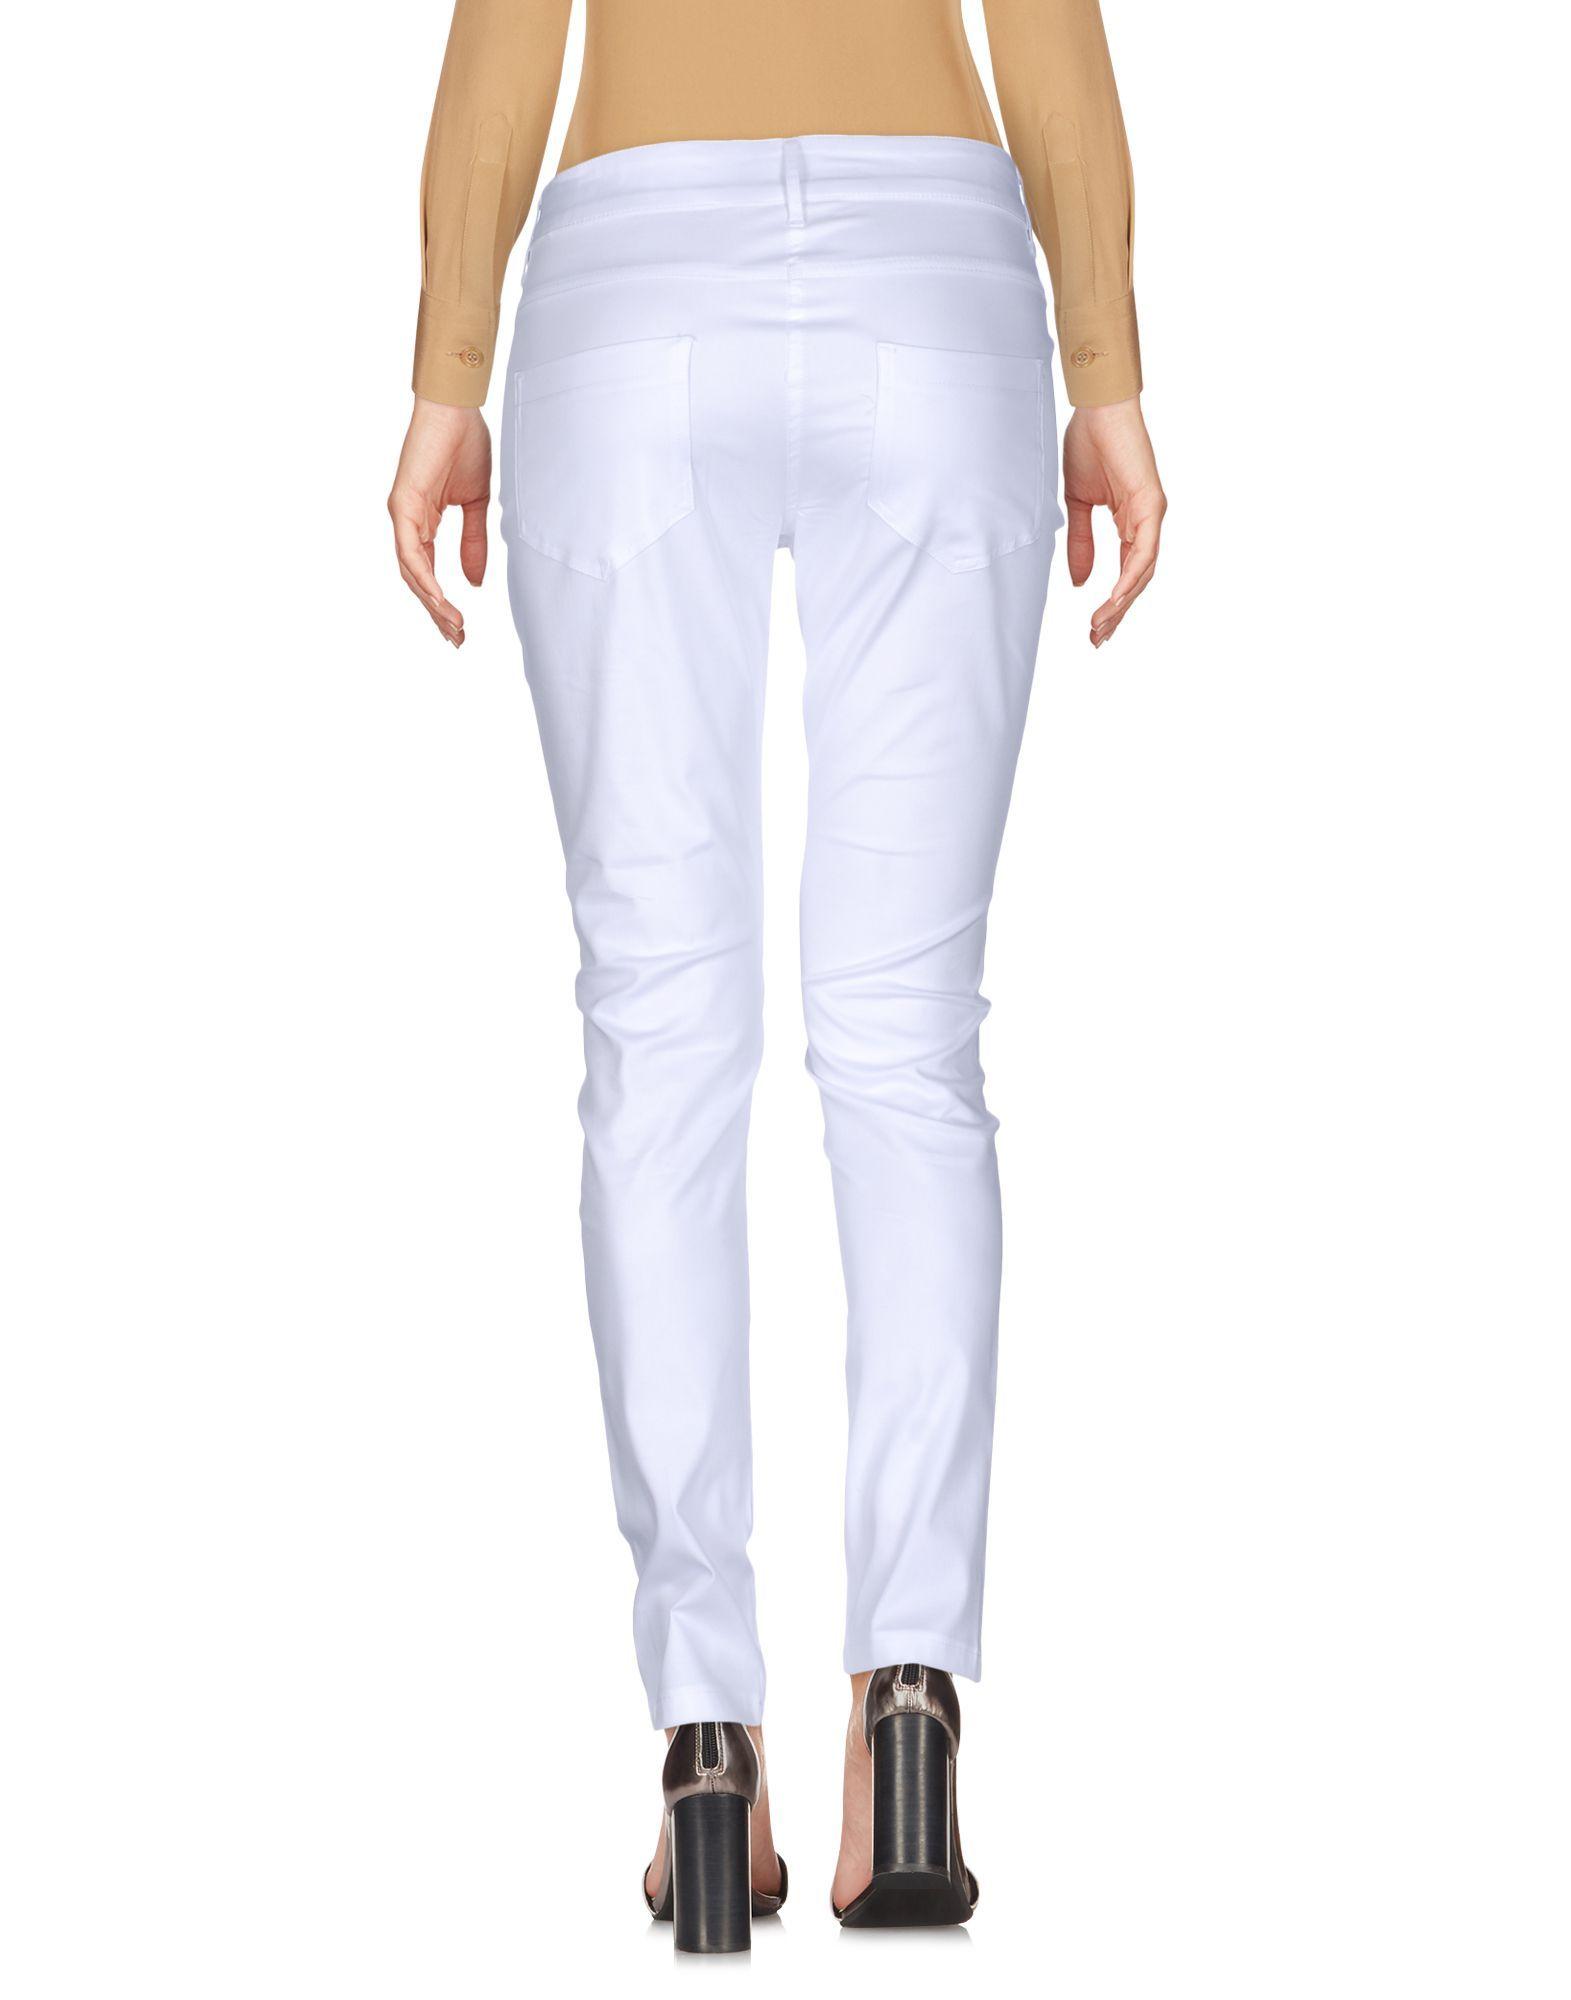 La Kore White Cotton Trousers